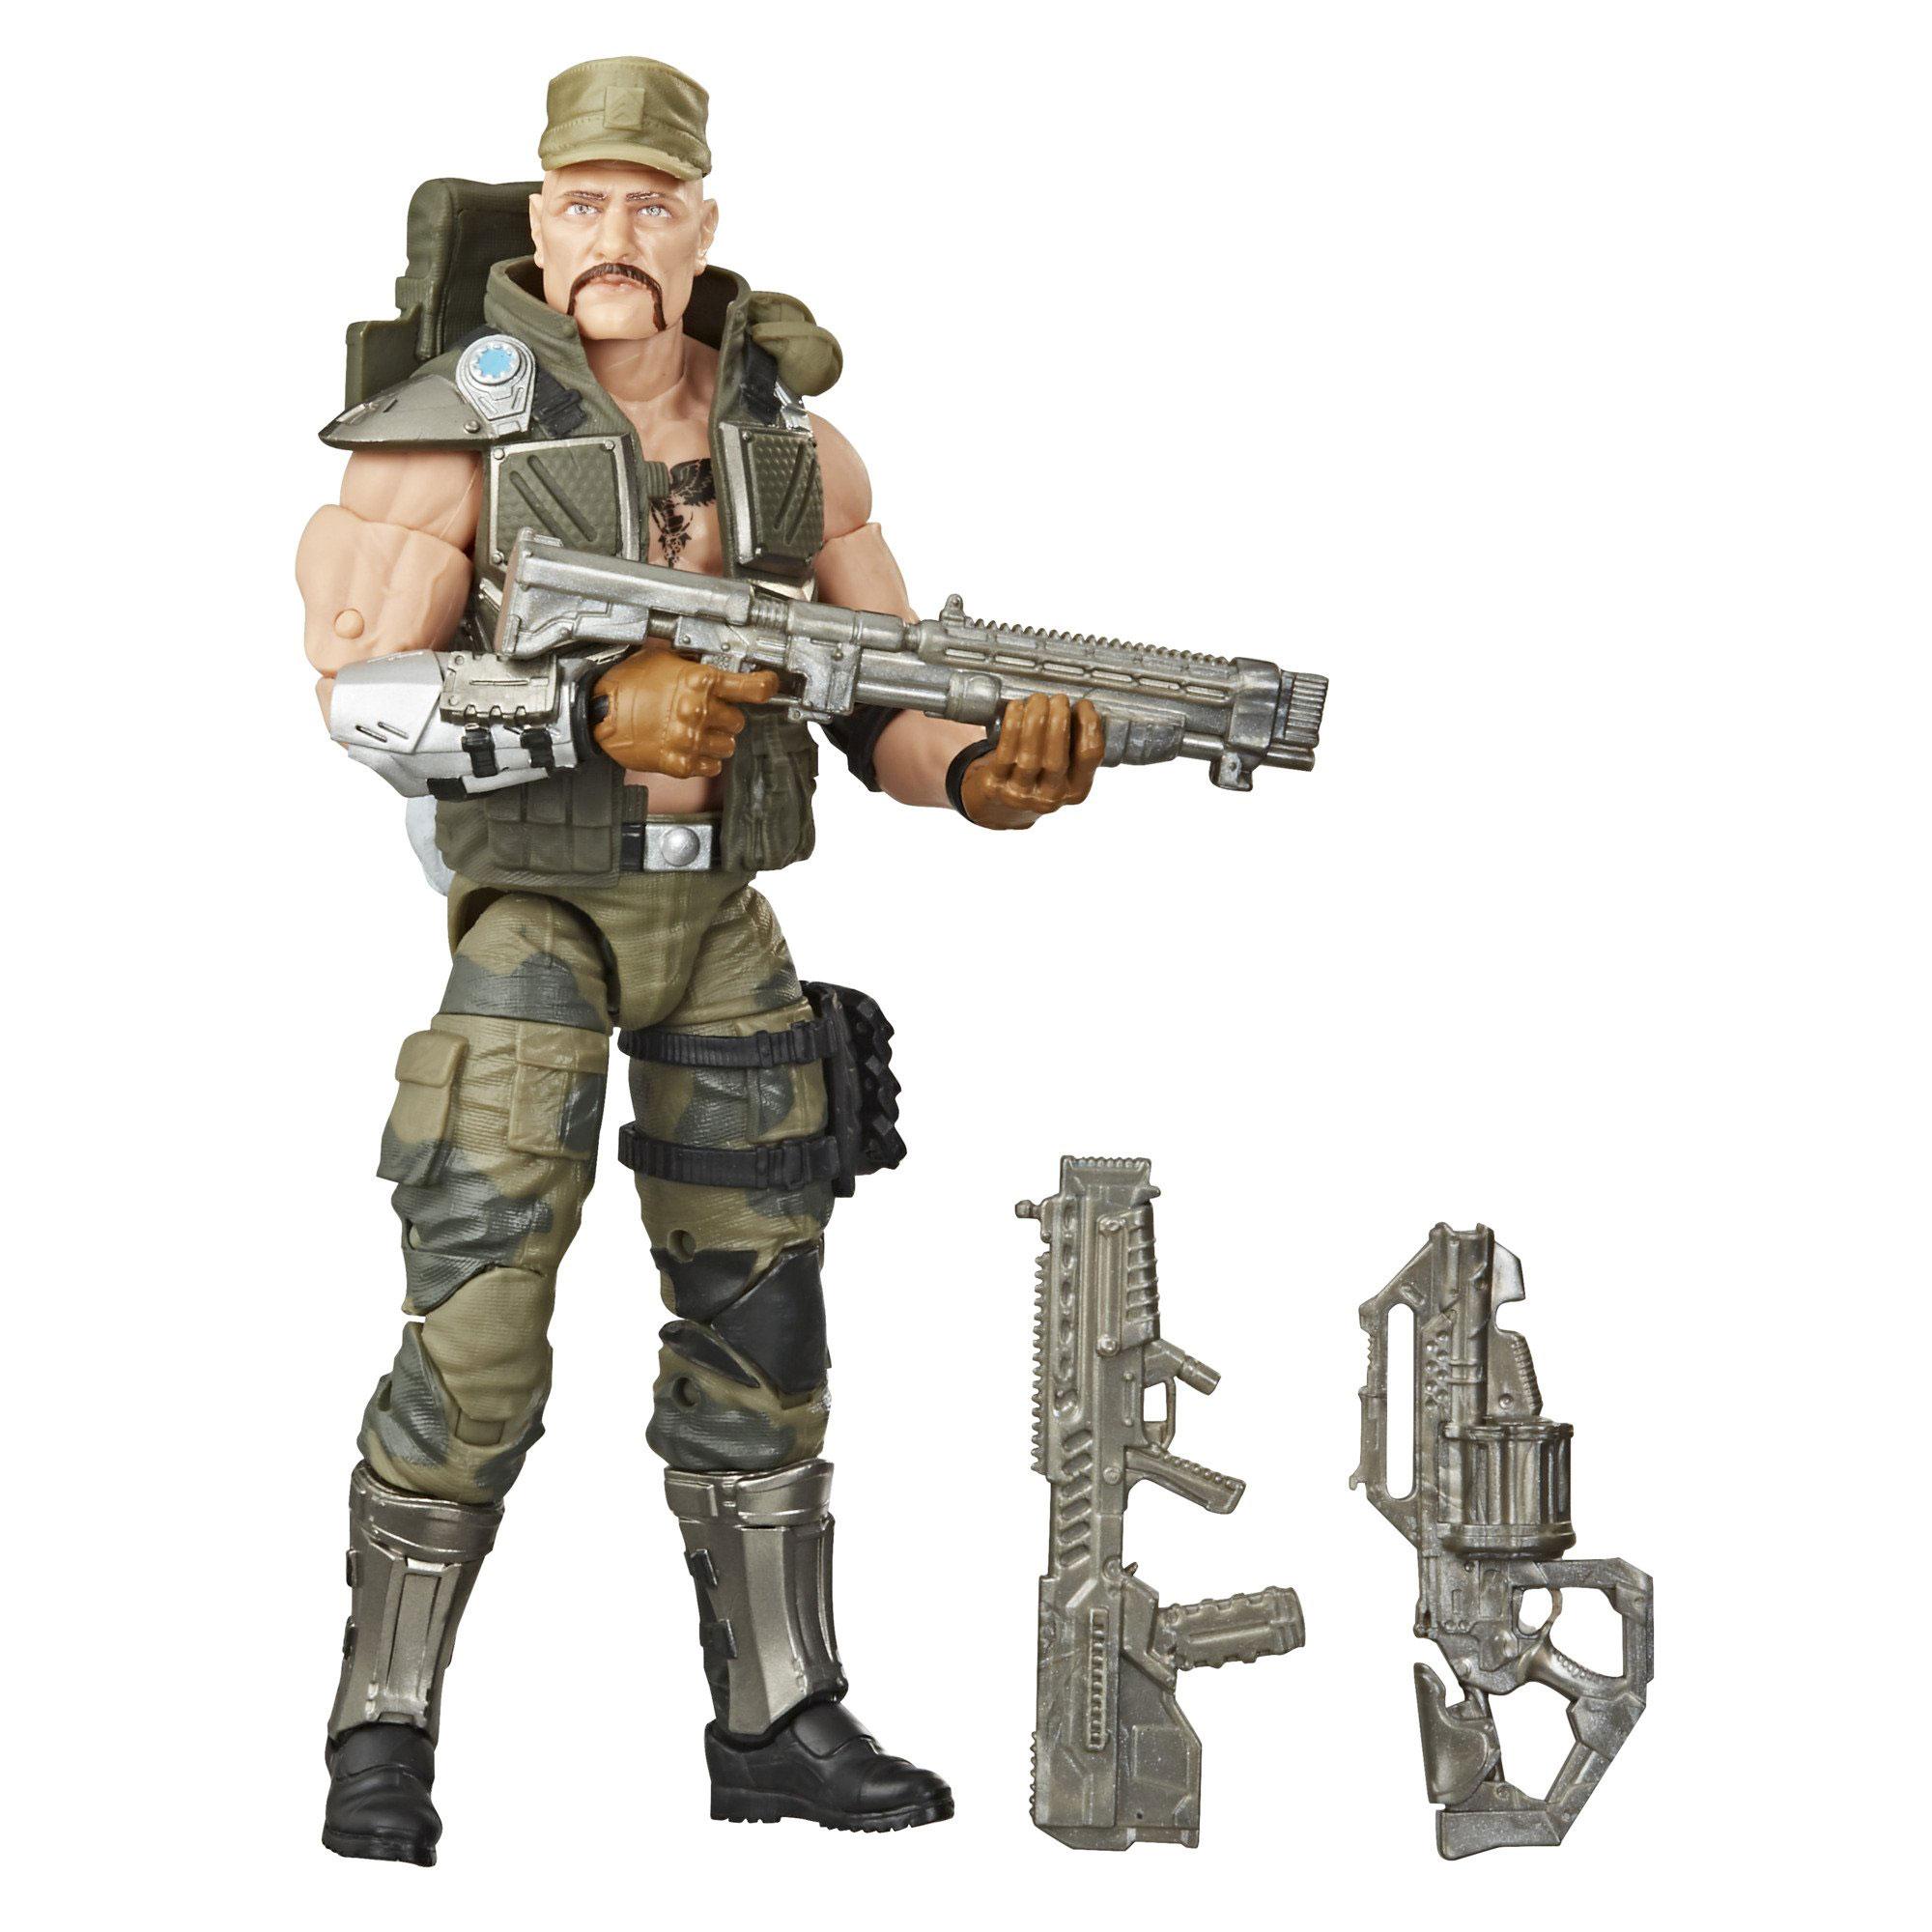 gung-ho-gi-joe-classified-figure